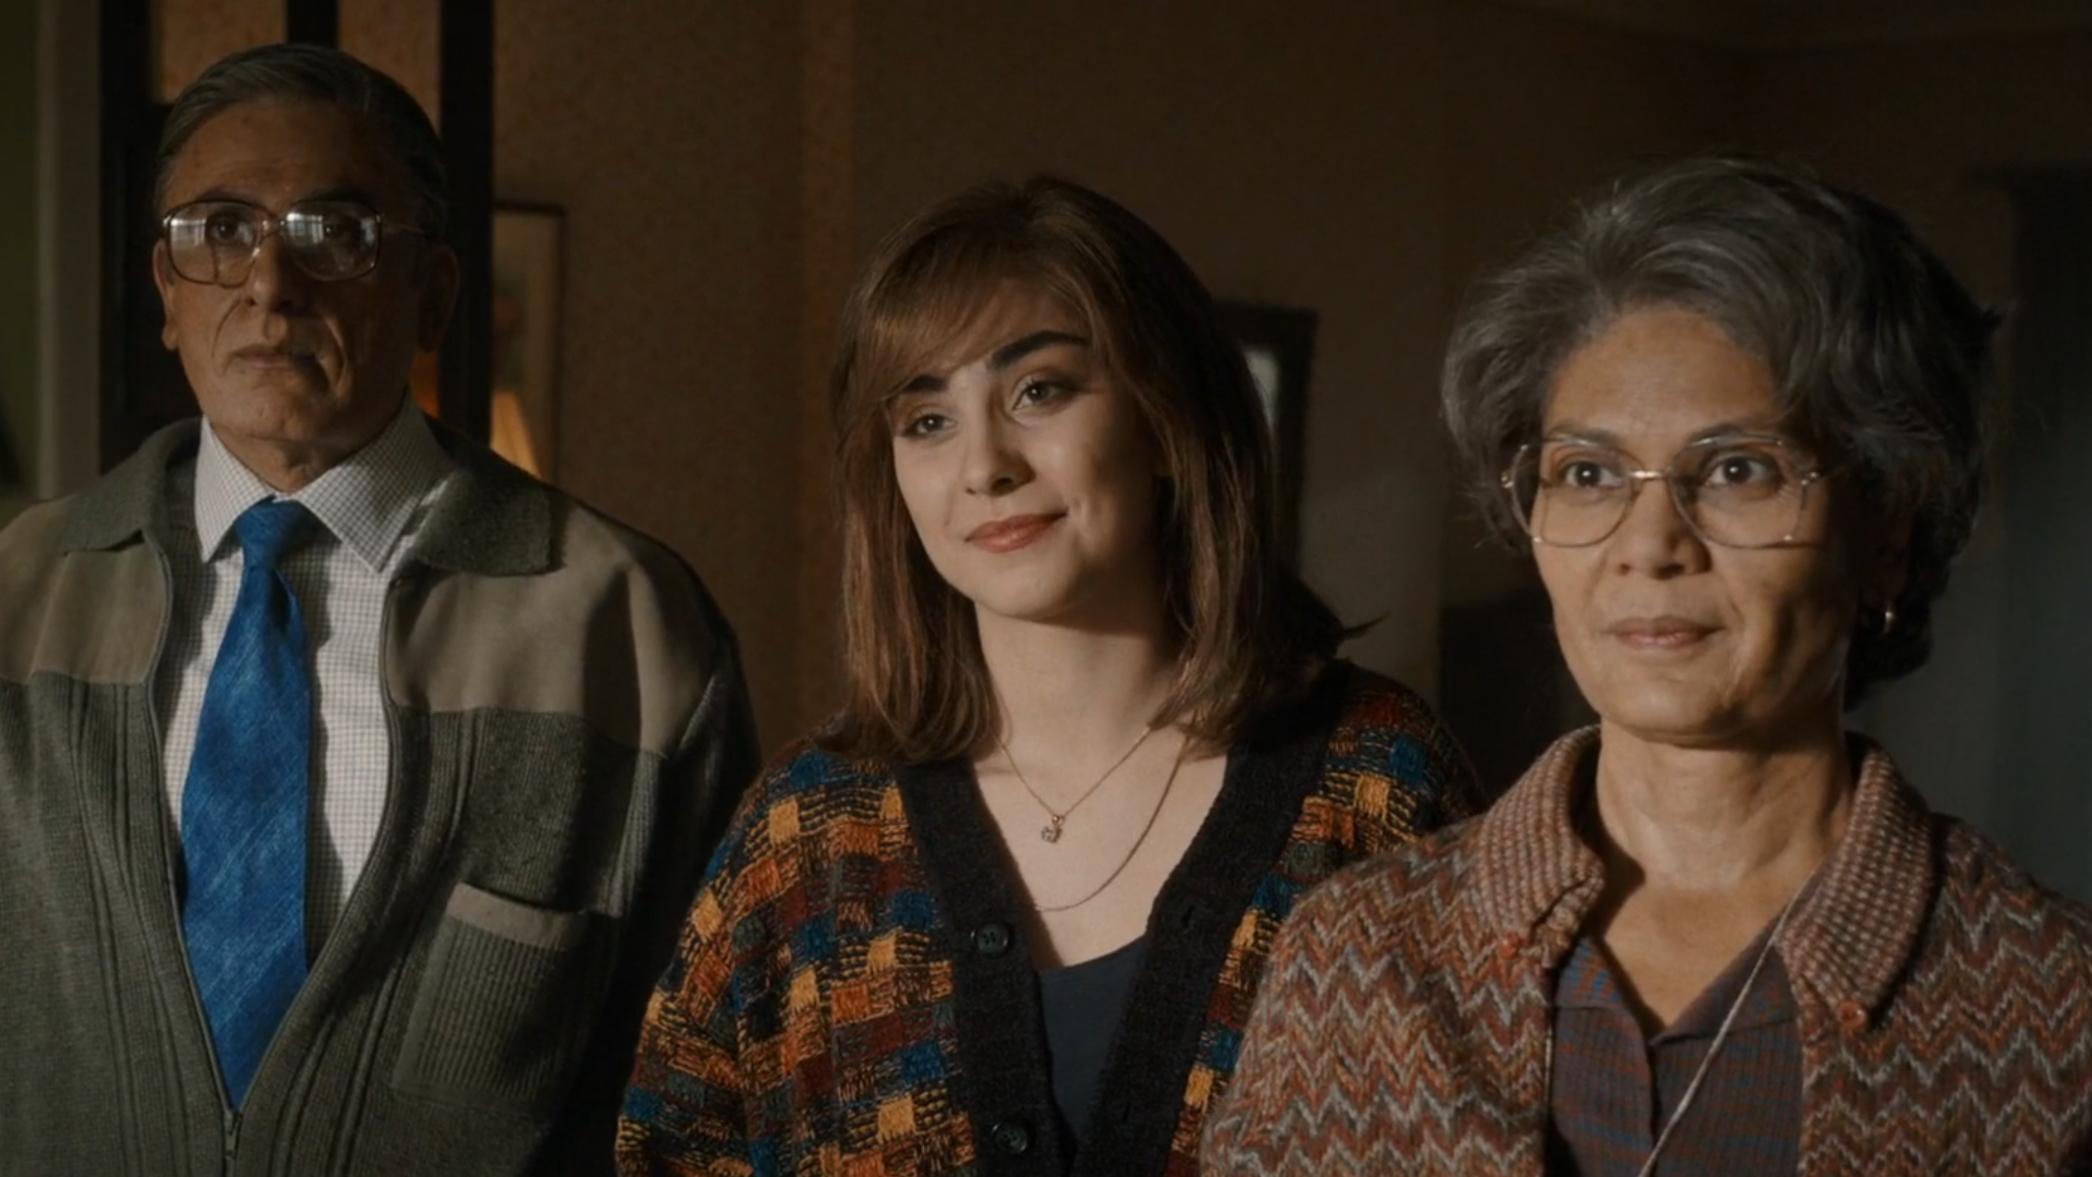 Ace Bhatti, Priya Blackburn, and Meneka Das playing Freddie's father, sister, and mother in  Bohemian Rhapsody